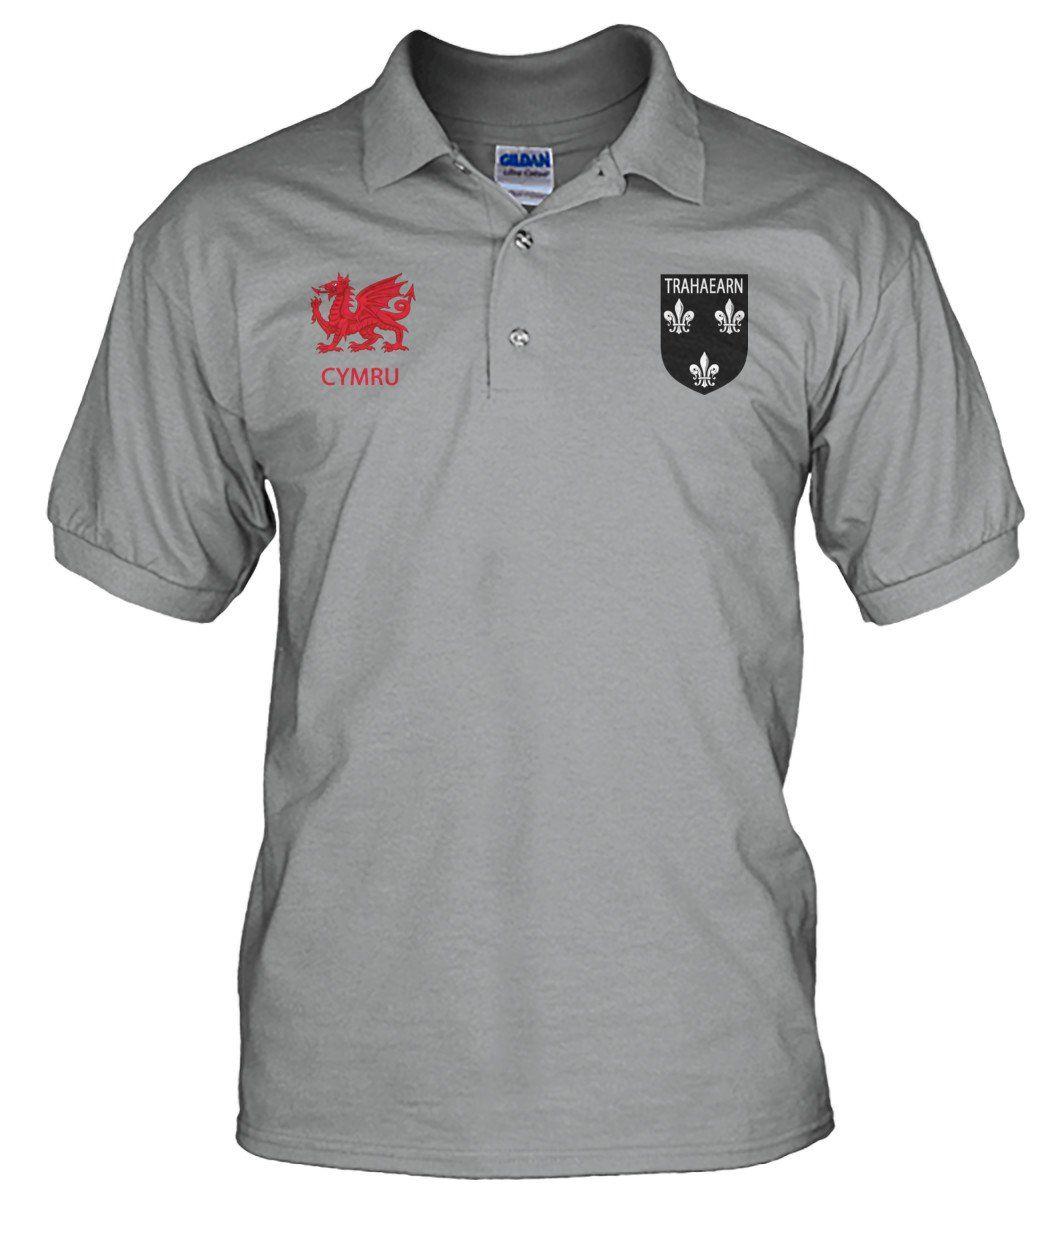 Wales Polo Shirt - Trahaearn (Ap Caradog, King Of Gwynedd) Badge (Men s) A9 ee7d1674b6